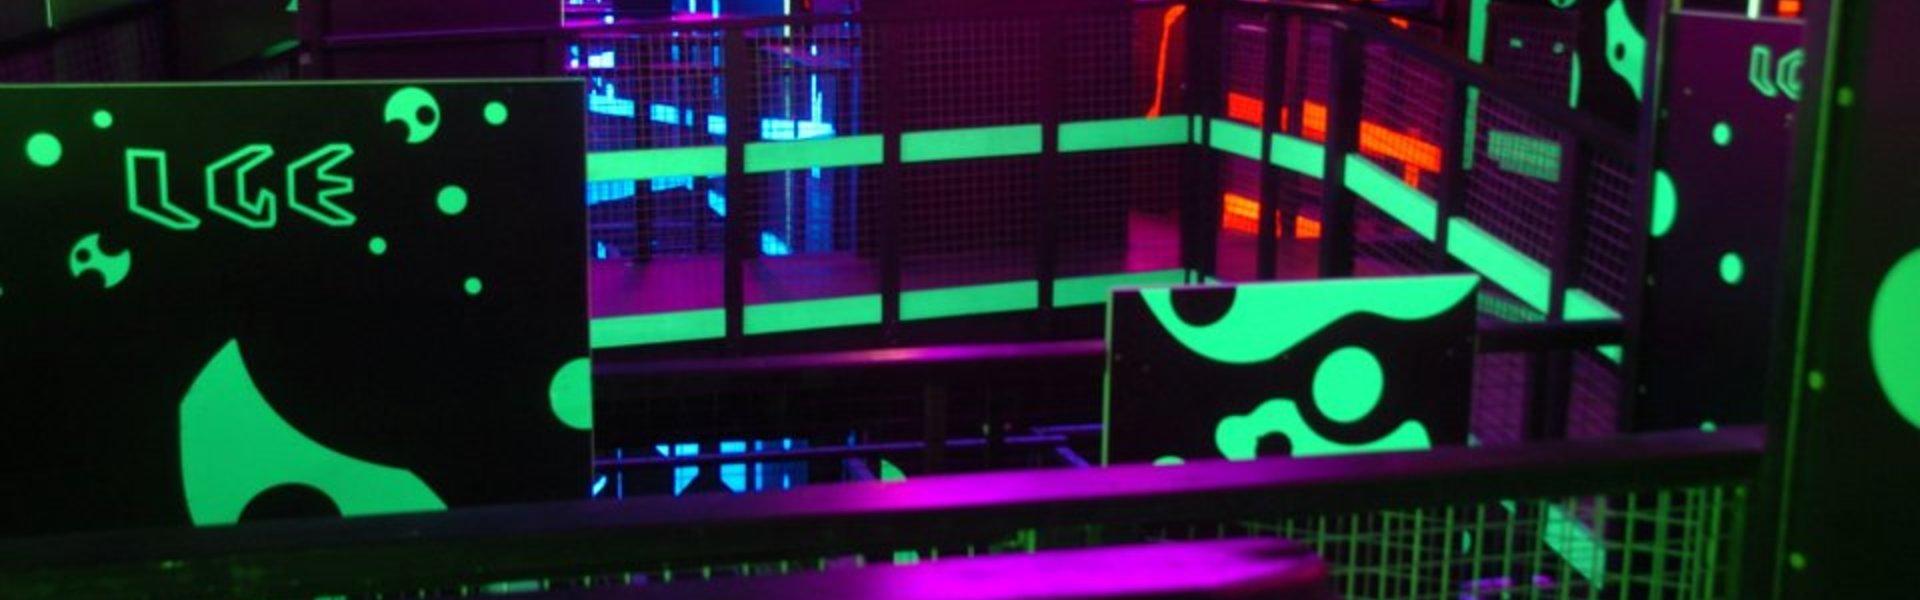 laser game Auvergne